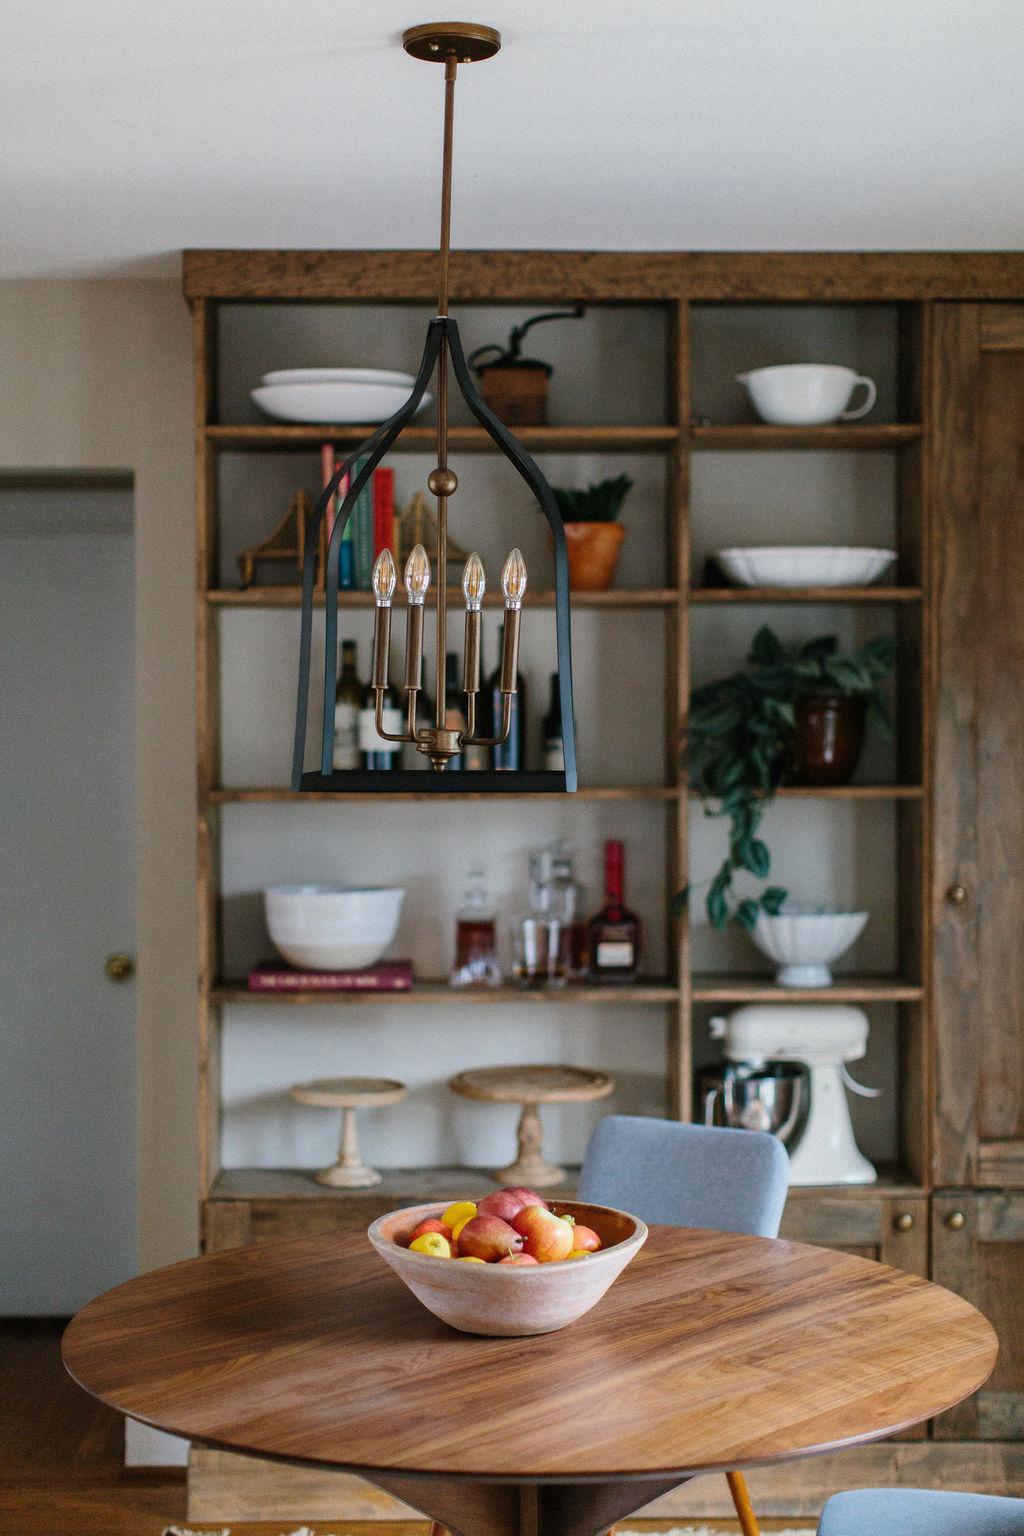 Journey-Jacobs-Design-Studio-Louisville-Residential-Commercial-Hospitality-Interior-Design-Traditional-Modern-7.JPG